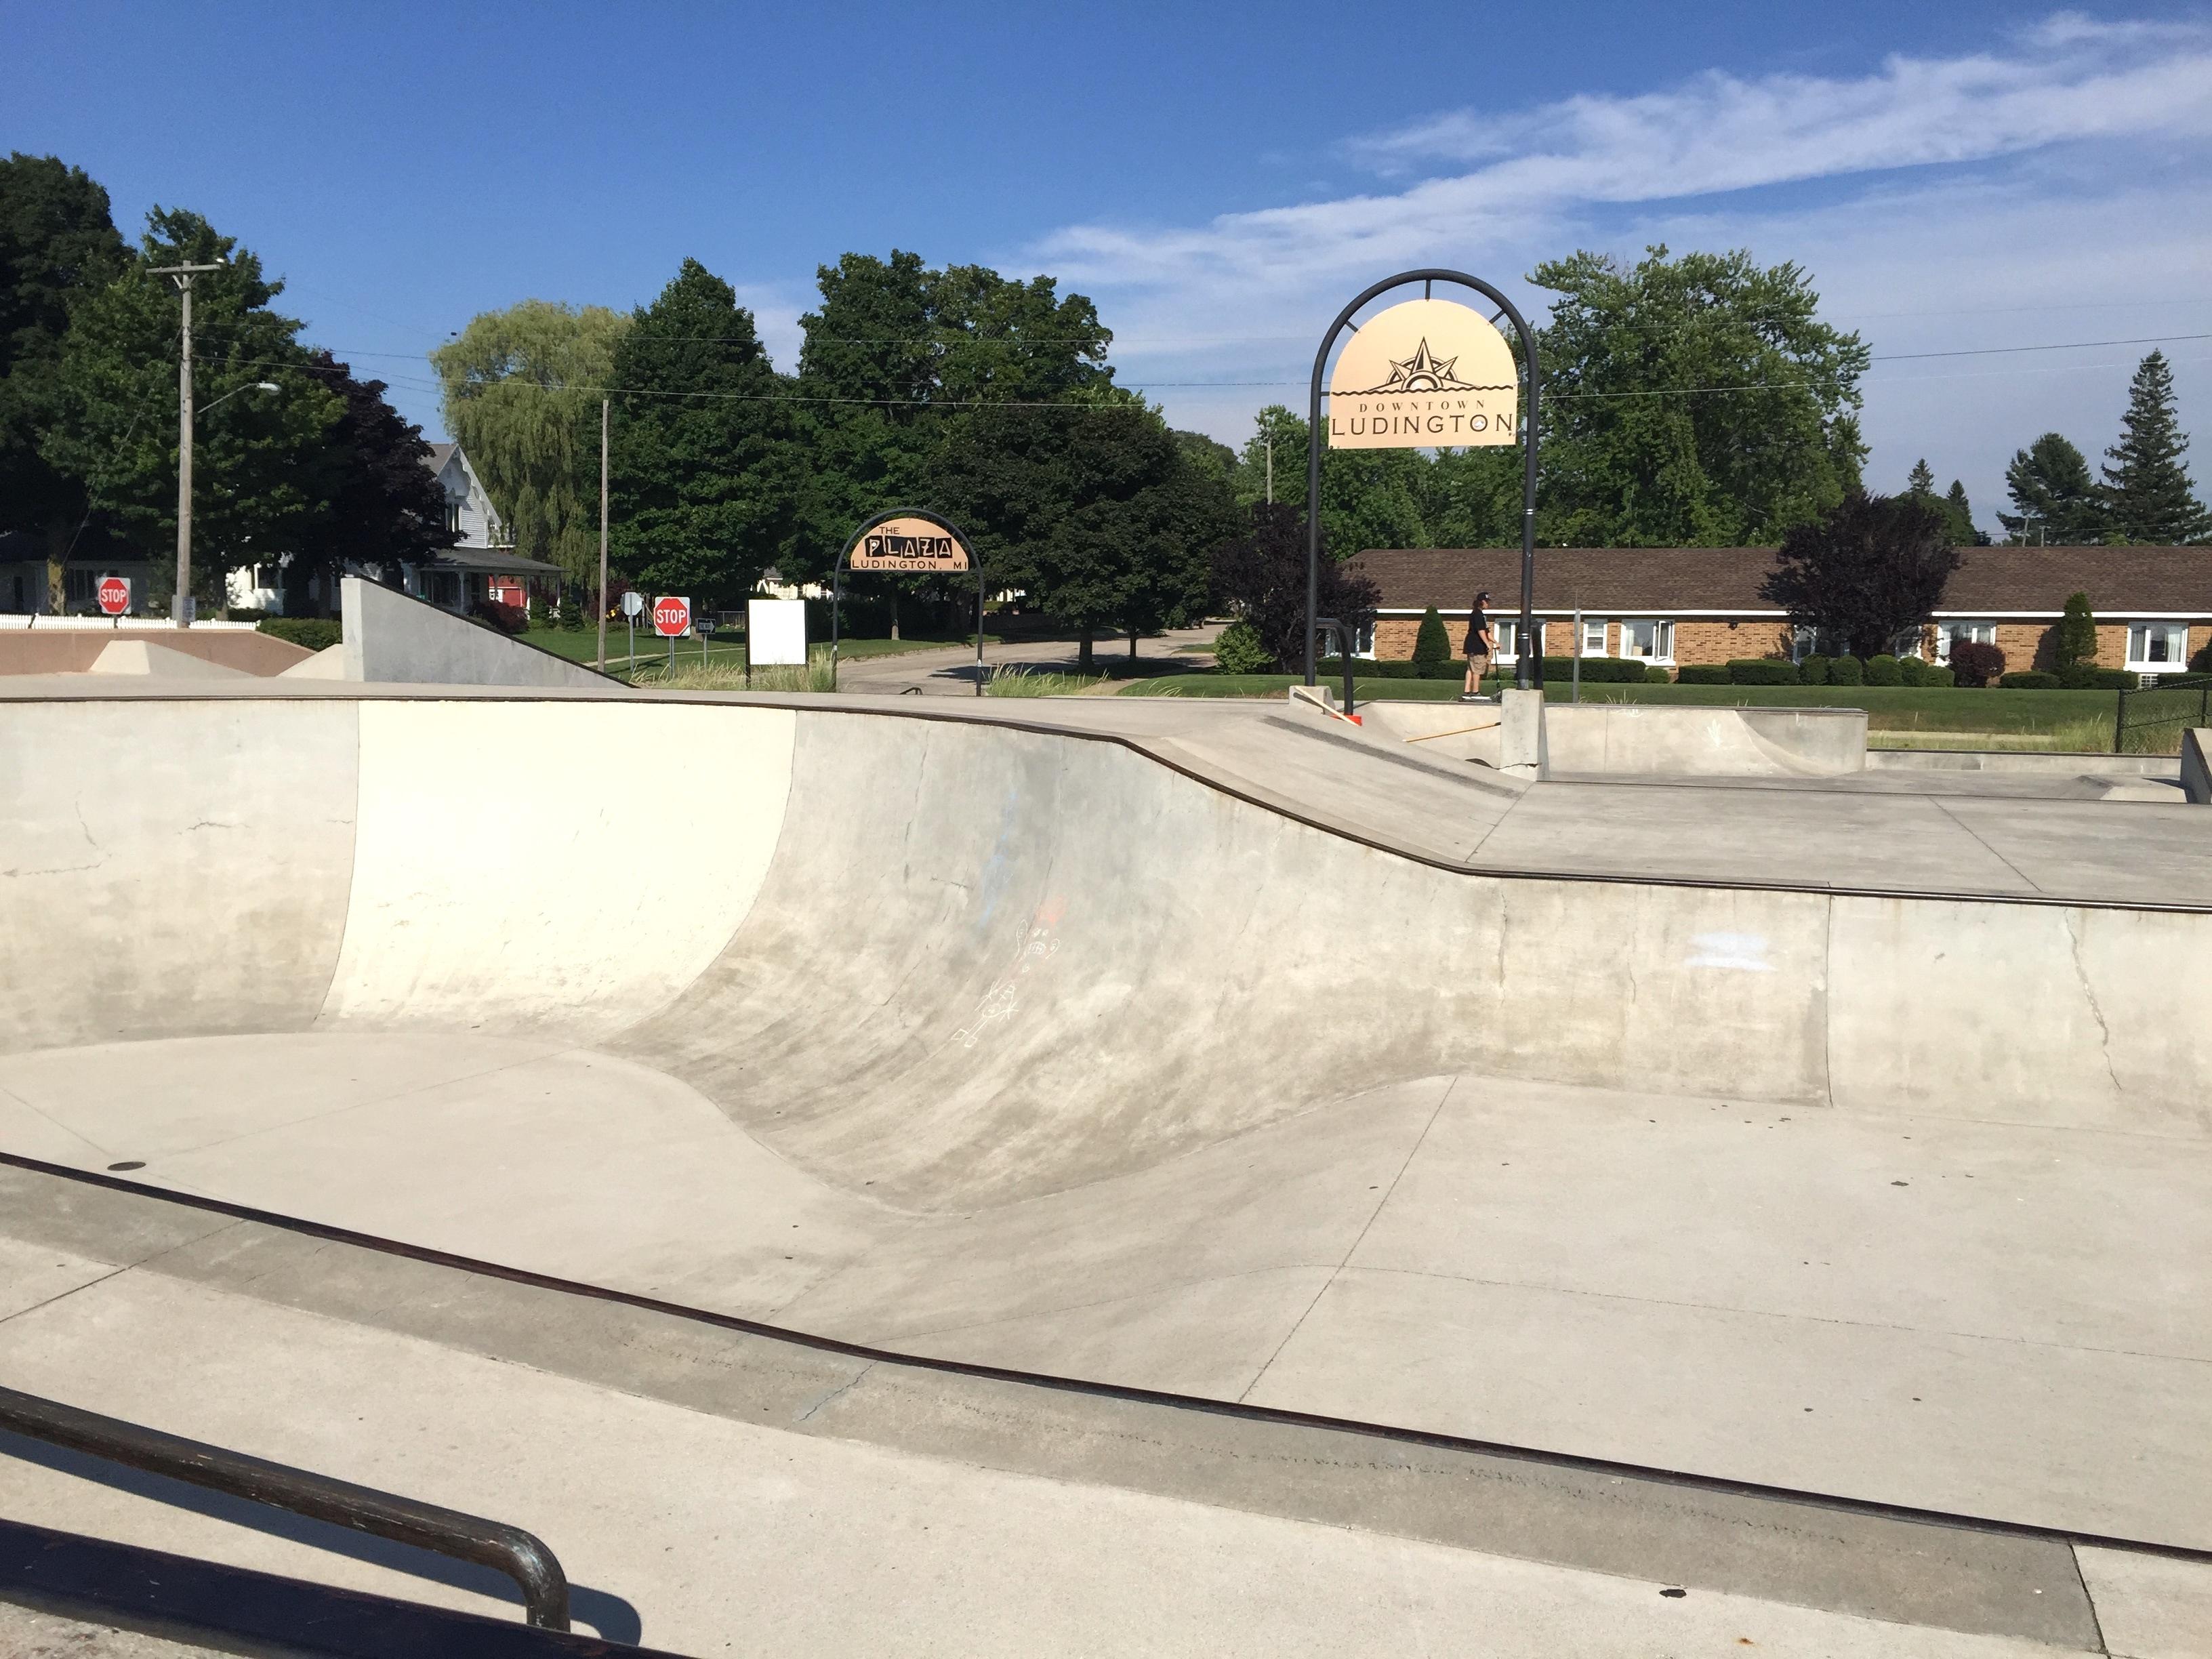 Plaza Skate Park